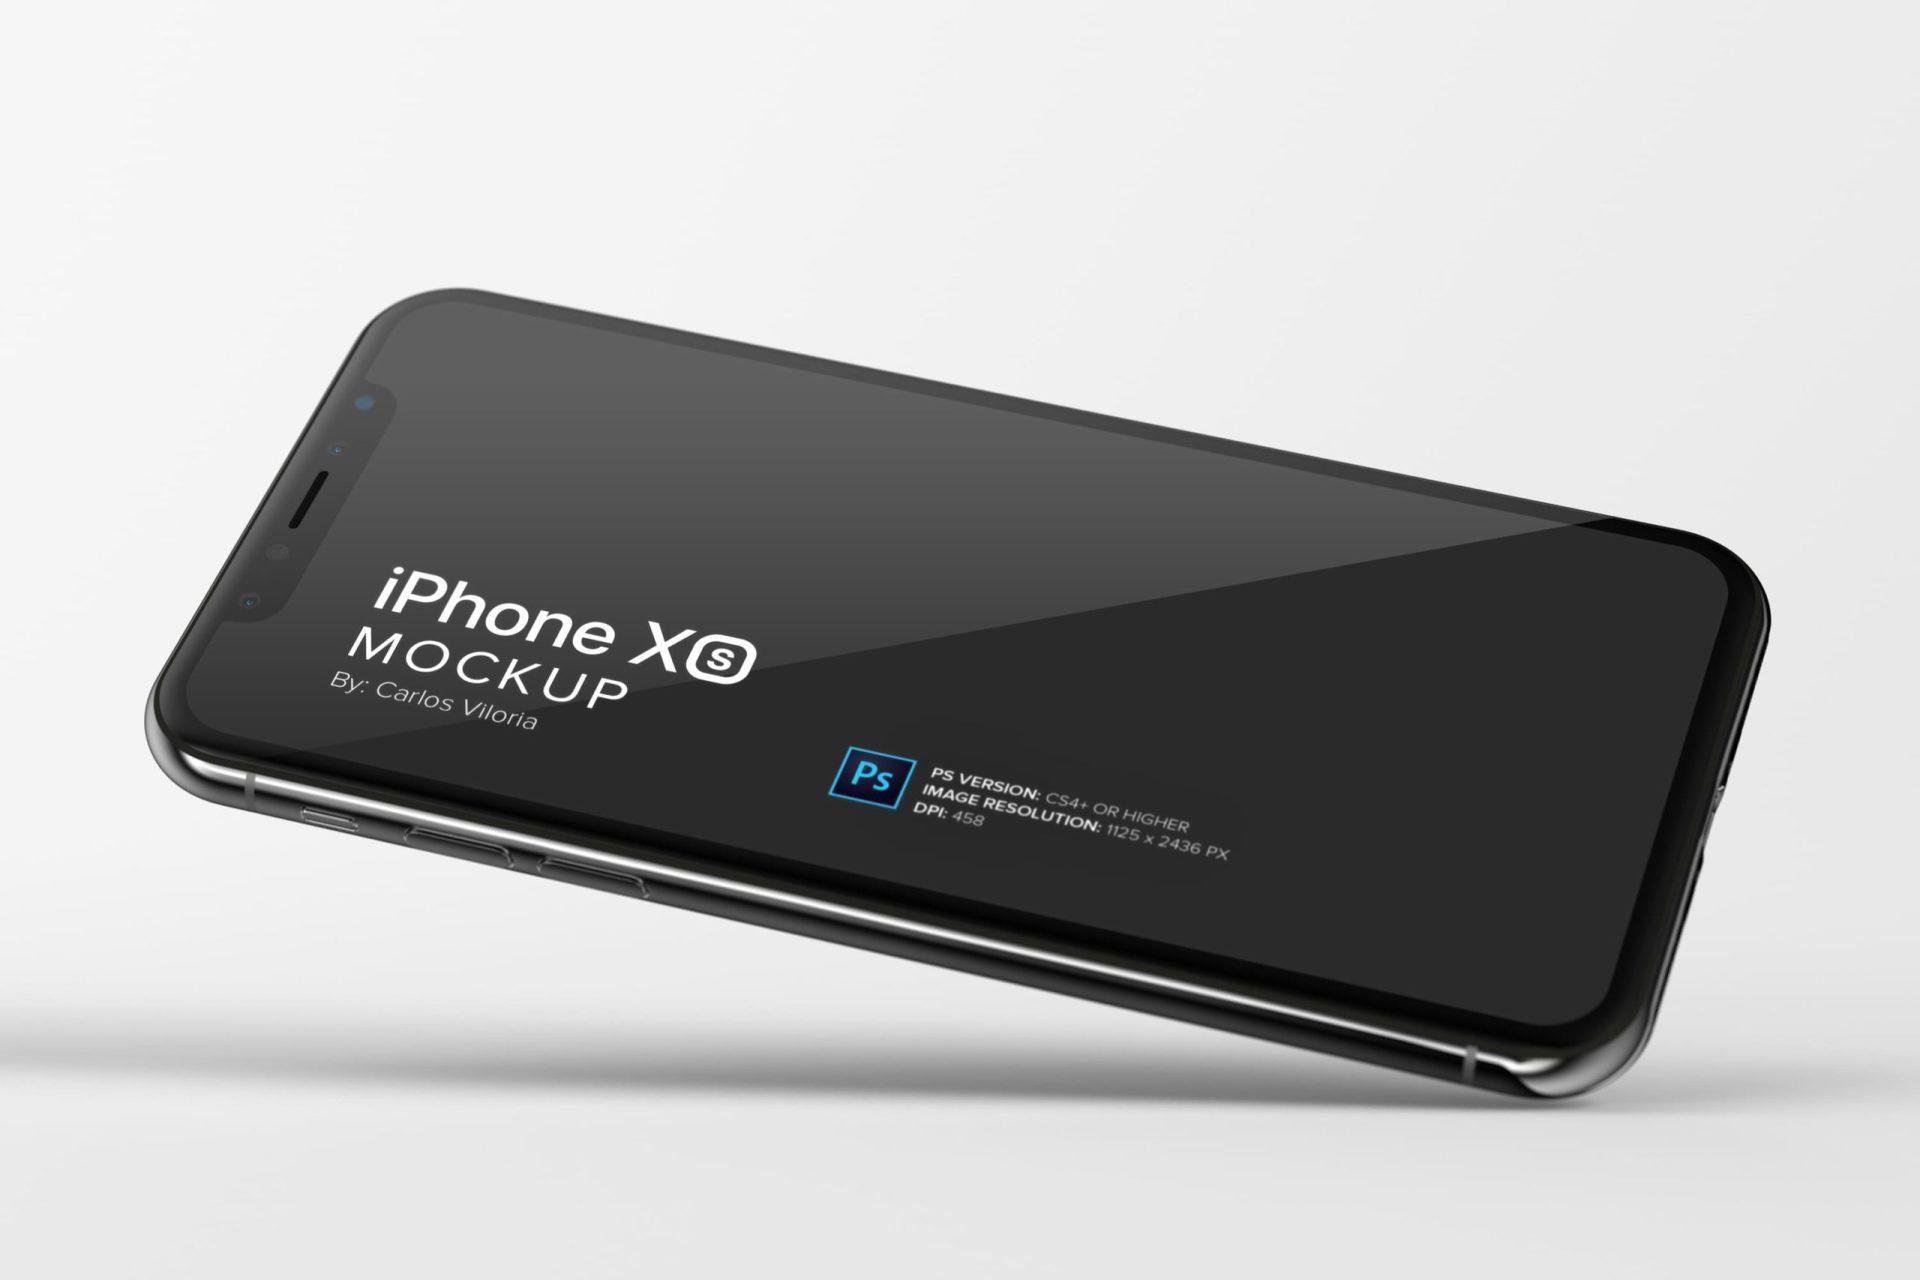 iPhone XS Mockup for Horizontal Design Views